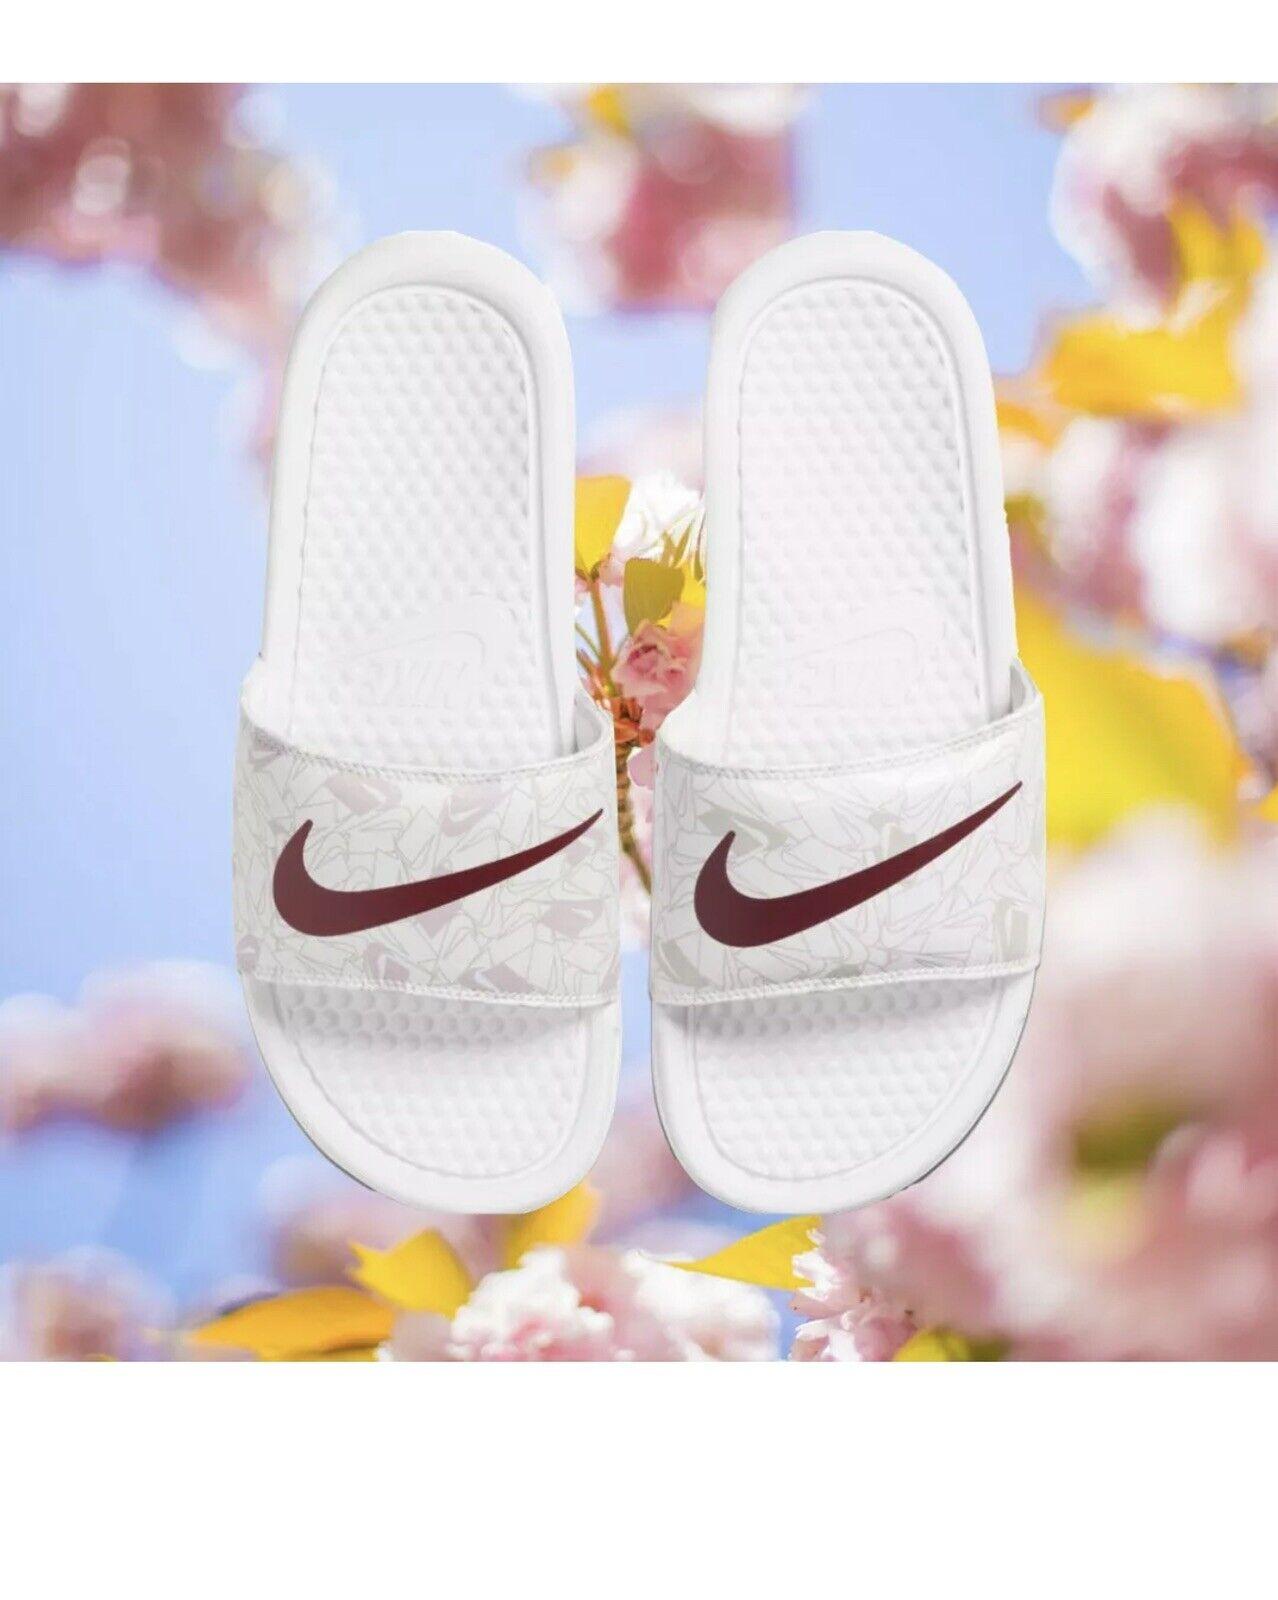 Nike Benassi Jdi curseurs Imprimé Motif-UK 6.5 US 9 EU 40.5 618919-117 Femmes